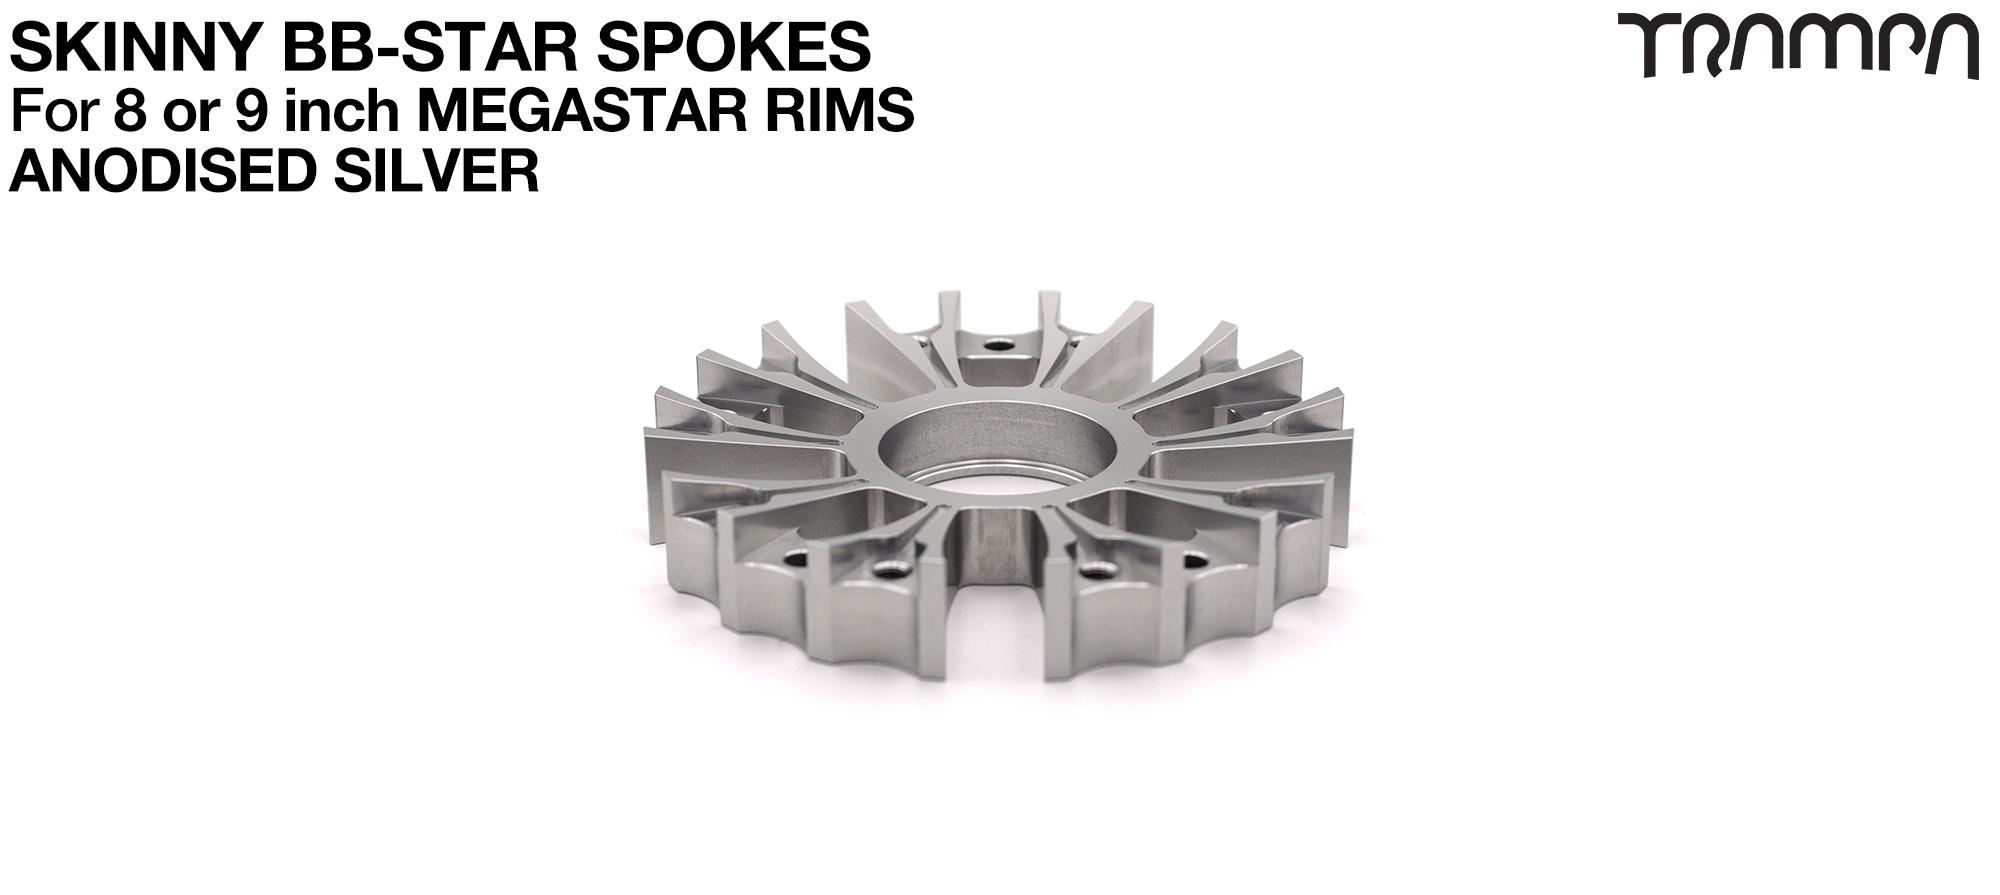 BB Star Spoke for 8 Inch DEEP-DISH MEGASTAR Rim - CNC Precision milled - SILVER